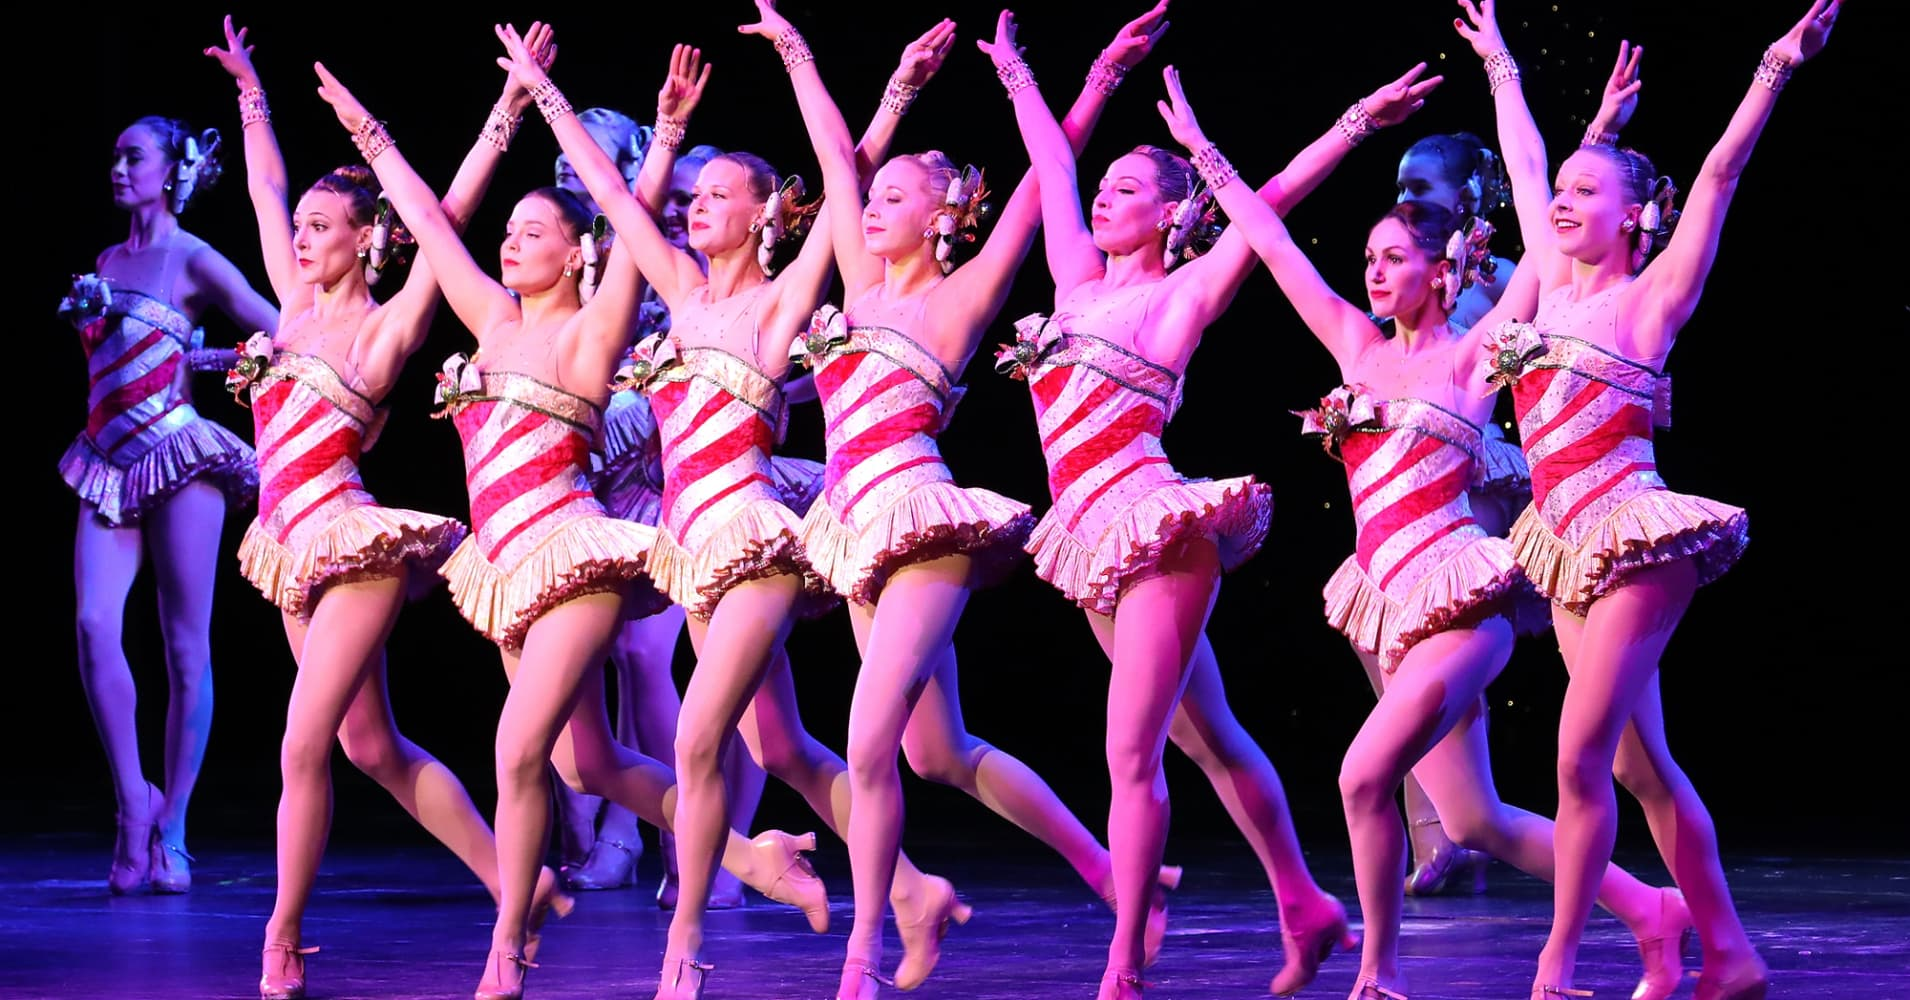 Dance or else: Rockettes pressured to perform at Trump ...